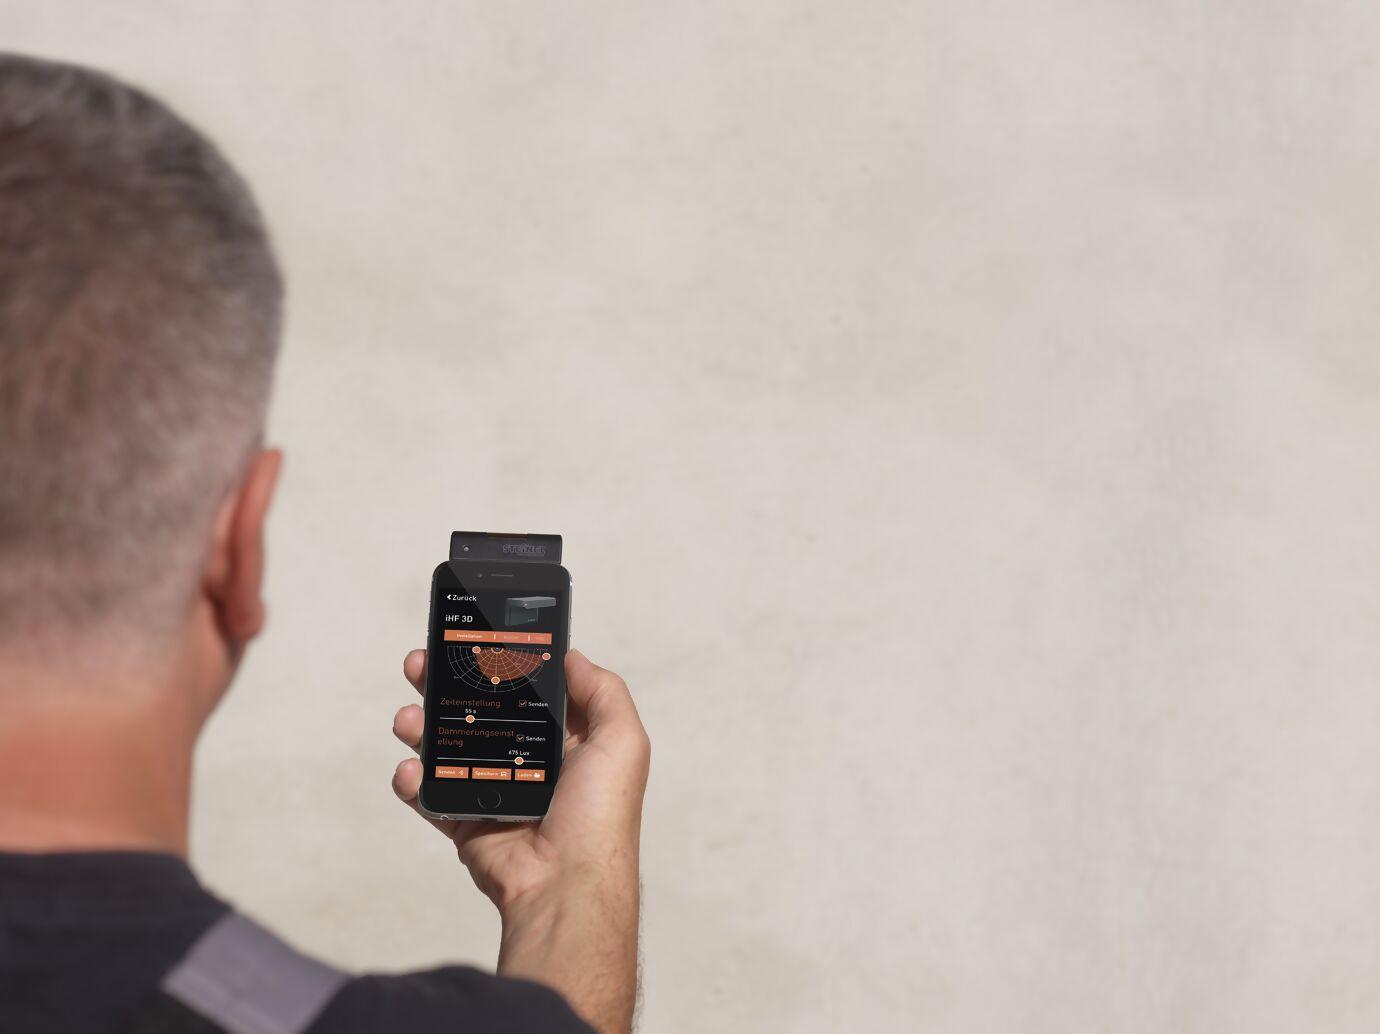 smart-remote-anwendung-handy.jpg